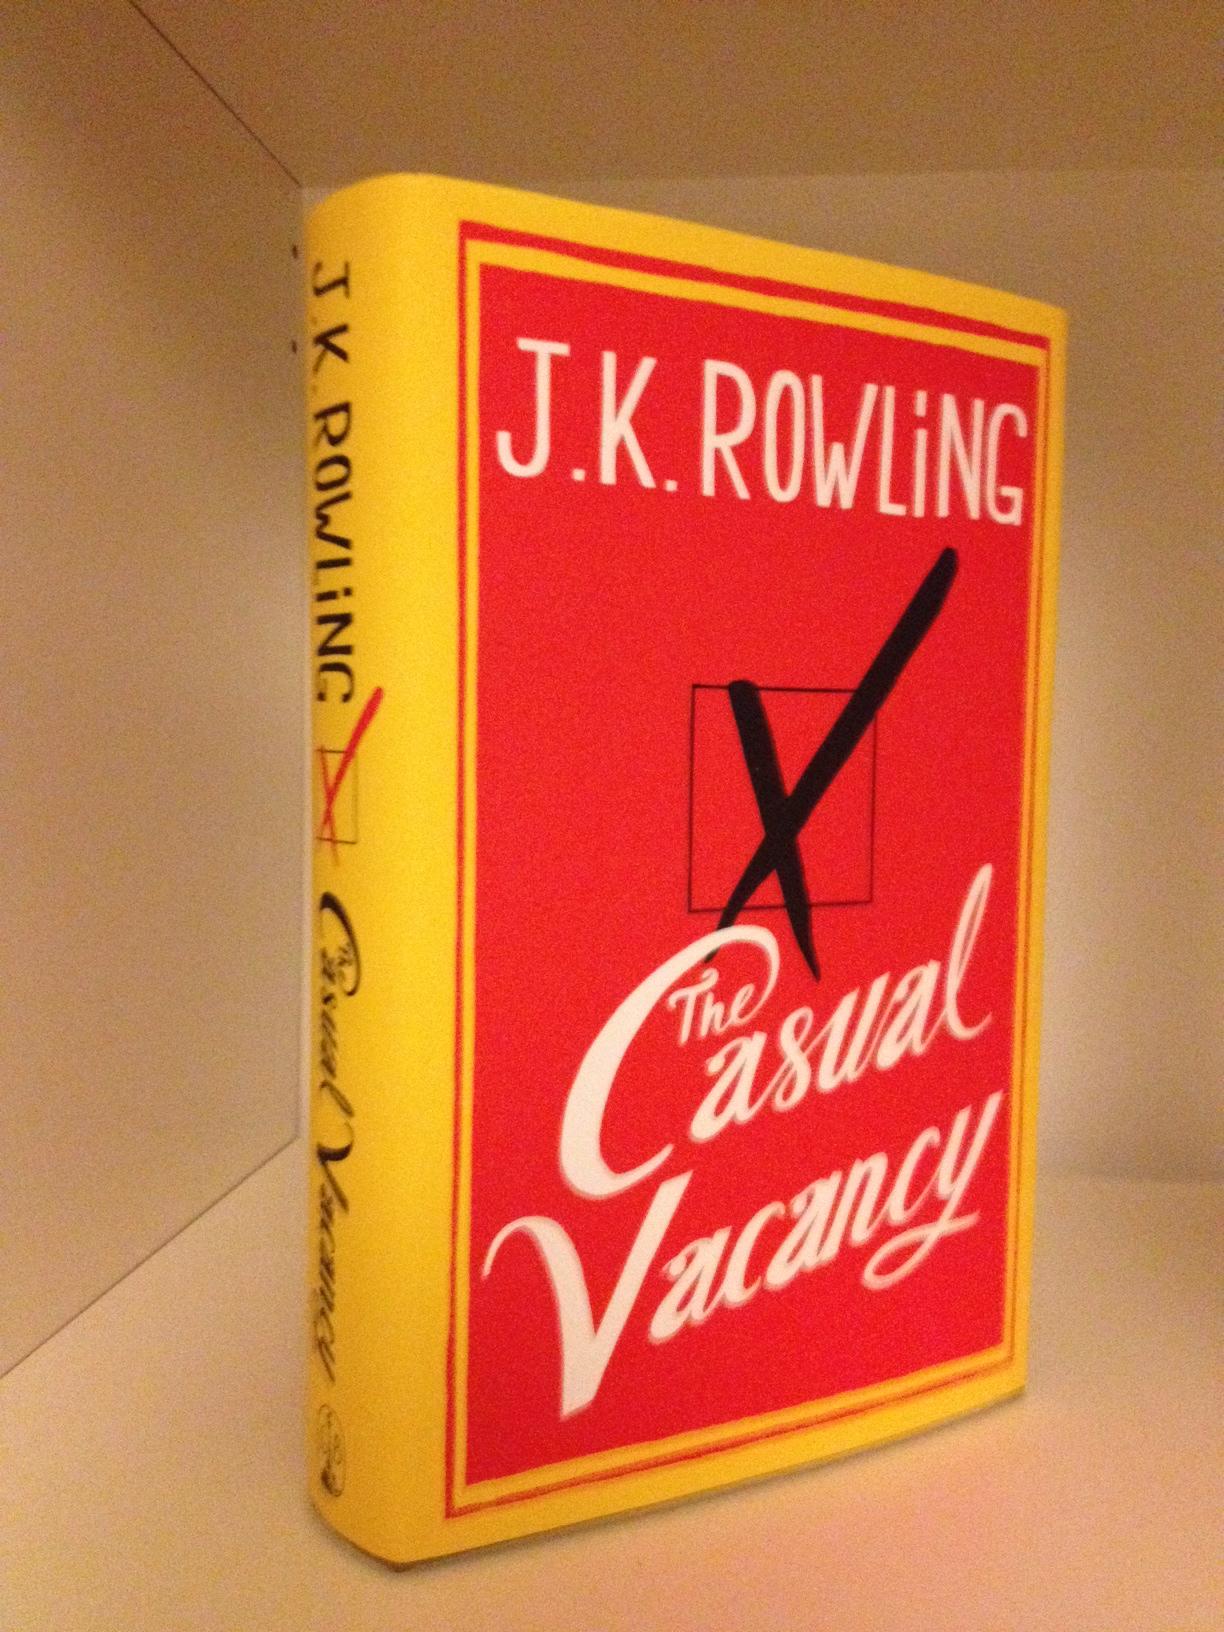 J K Rowling Book for Christmas - Savannah Page